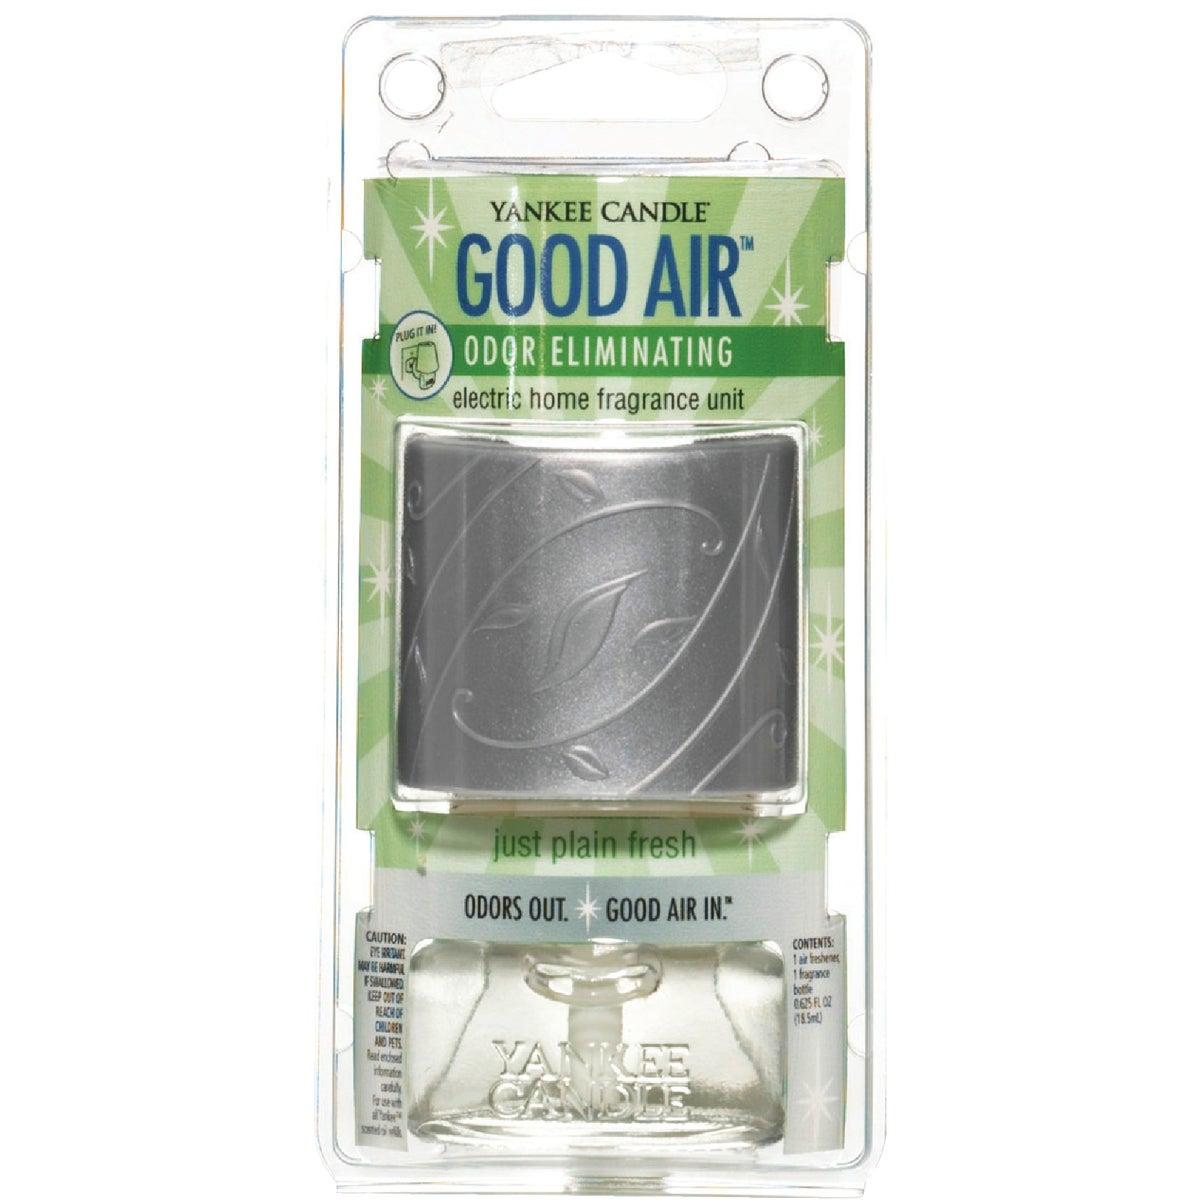 GOOD AIR ELECTRIC BASE